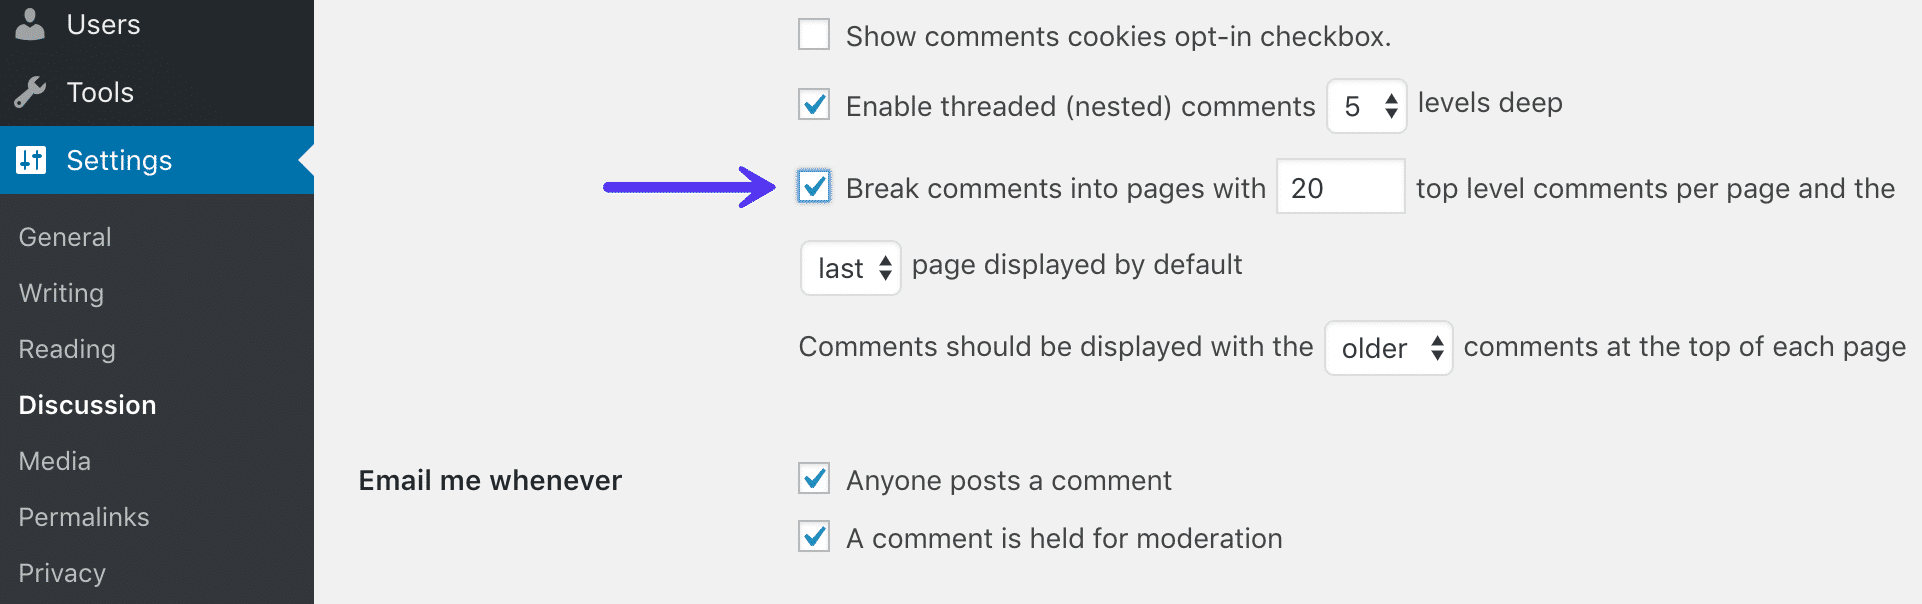 Dela upp kommentarer i sidor